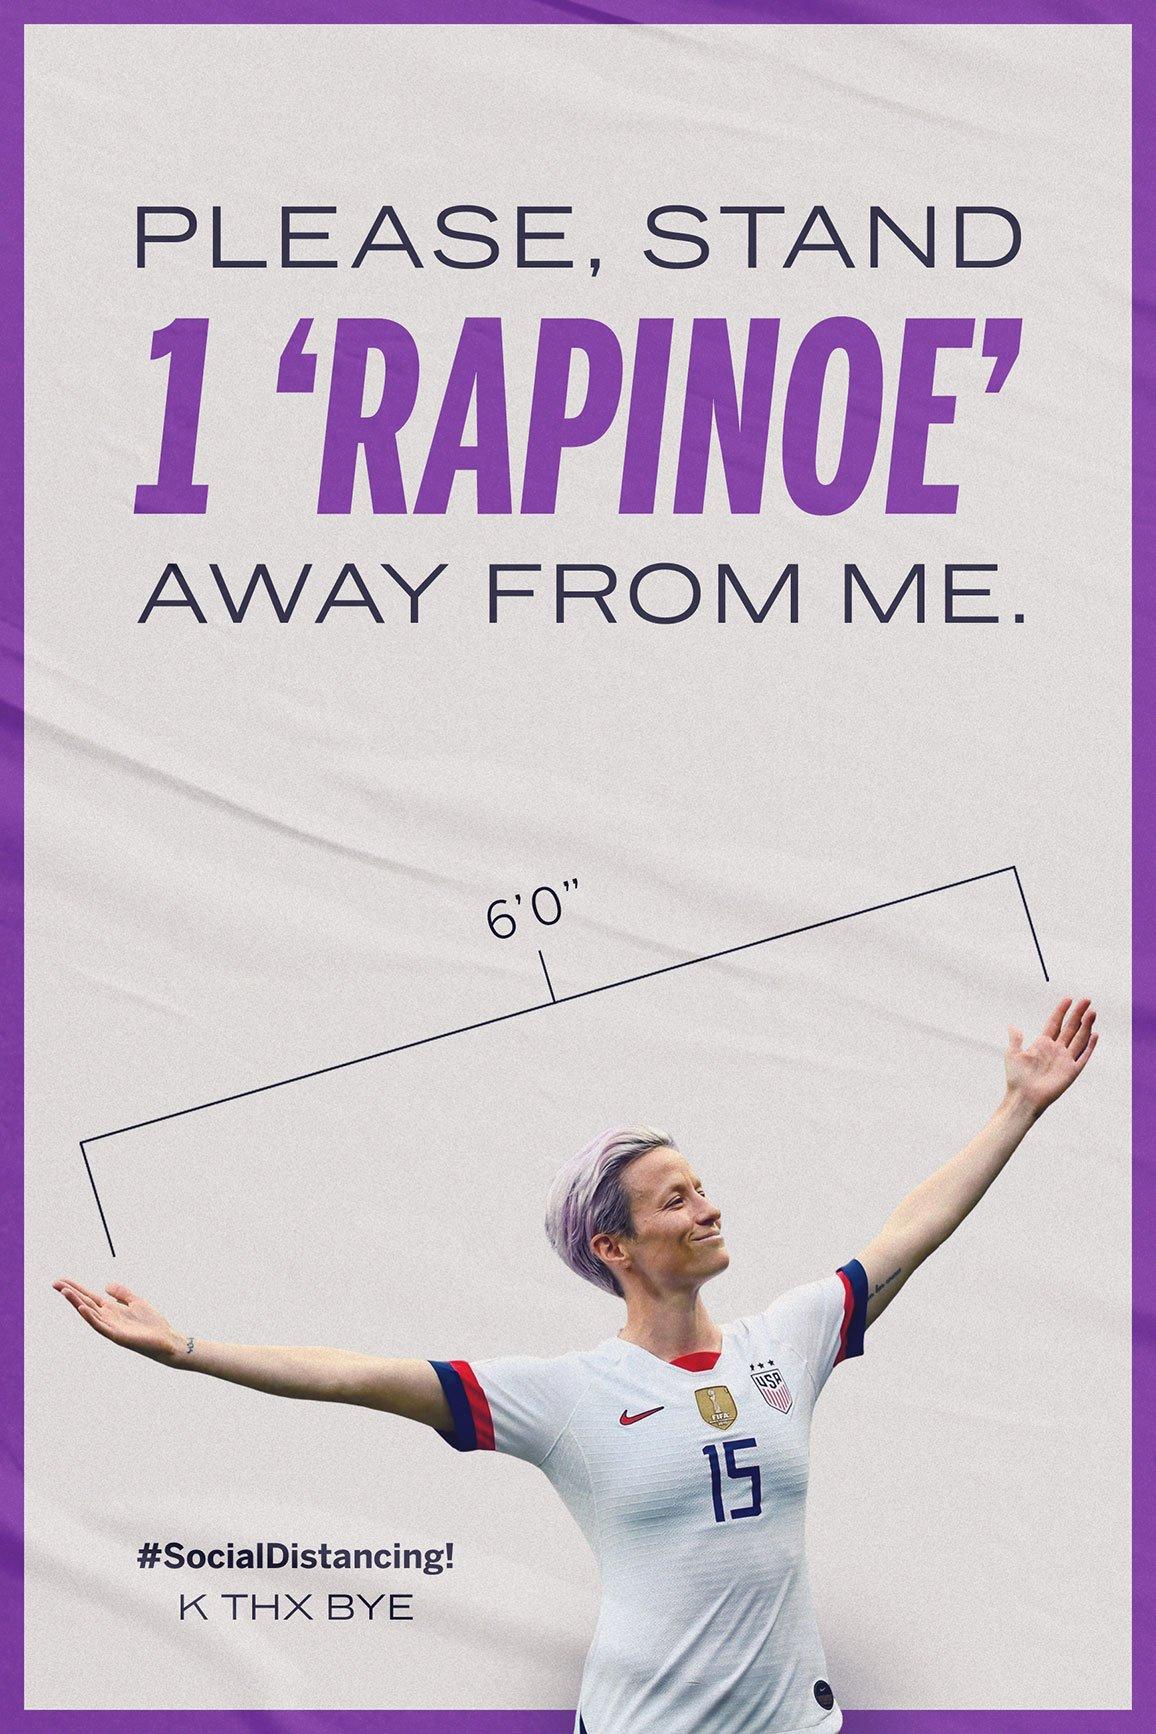 stand-6_rapinoe1_thumb